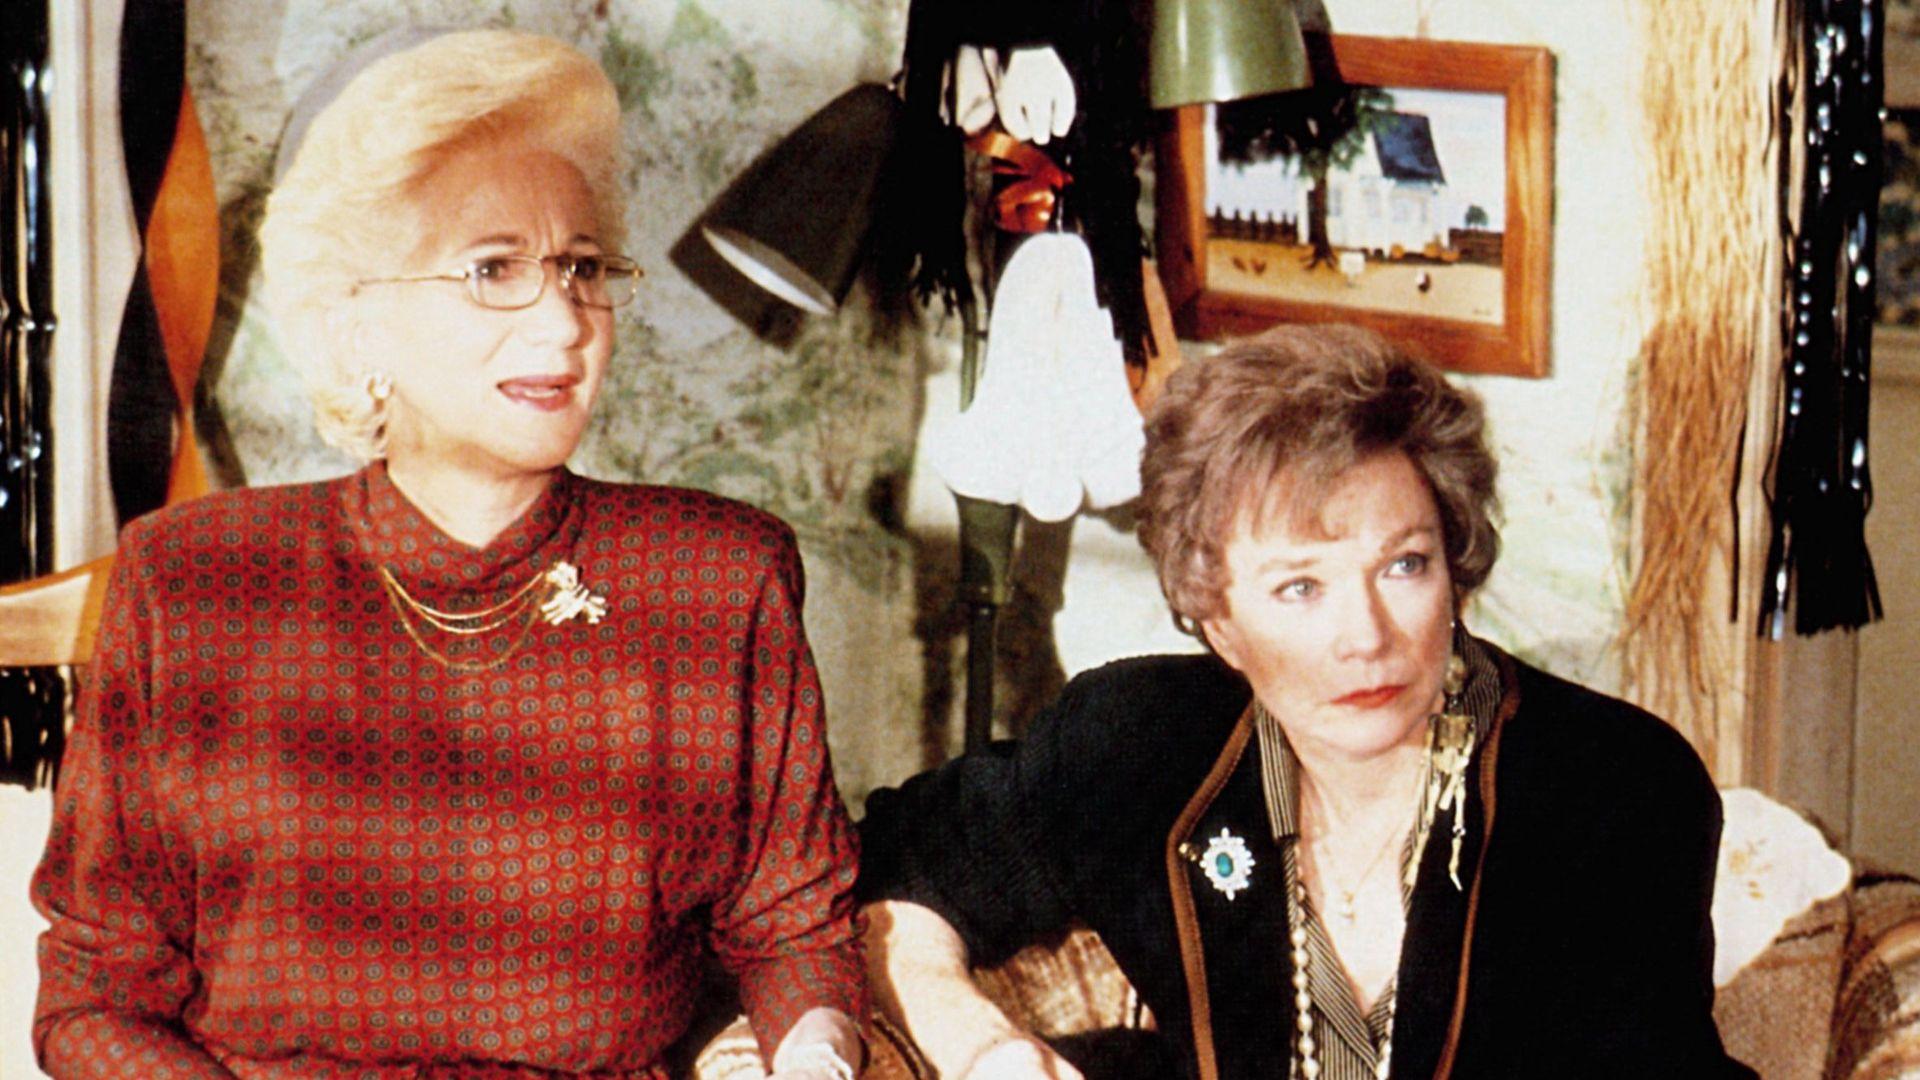 STEEL MAGNOLIAS, from left: Olympia Dukakis, Shirley MacLaine, 1989.